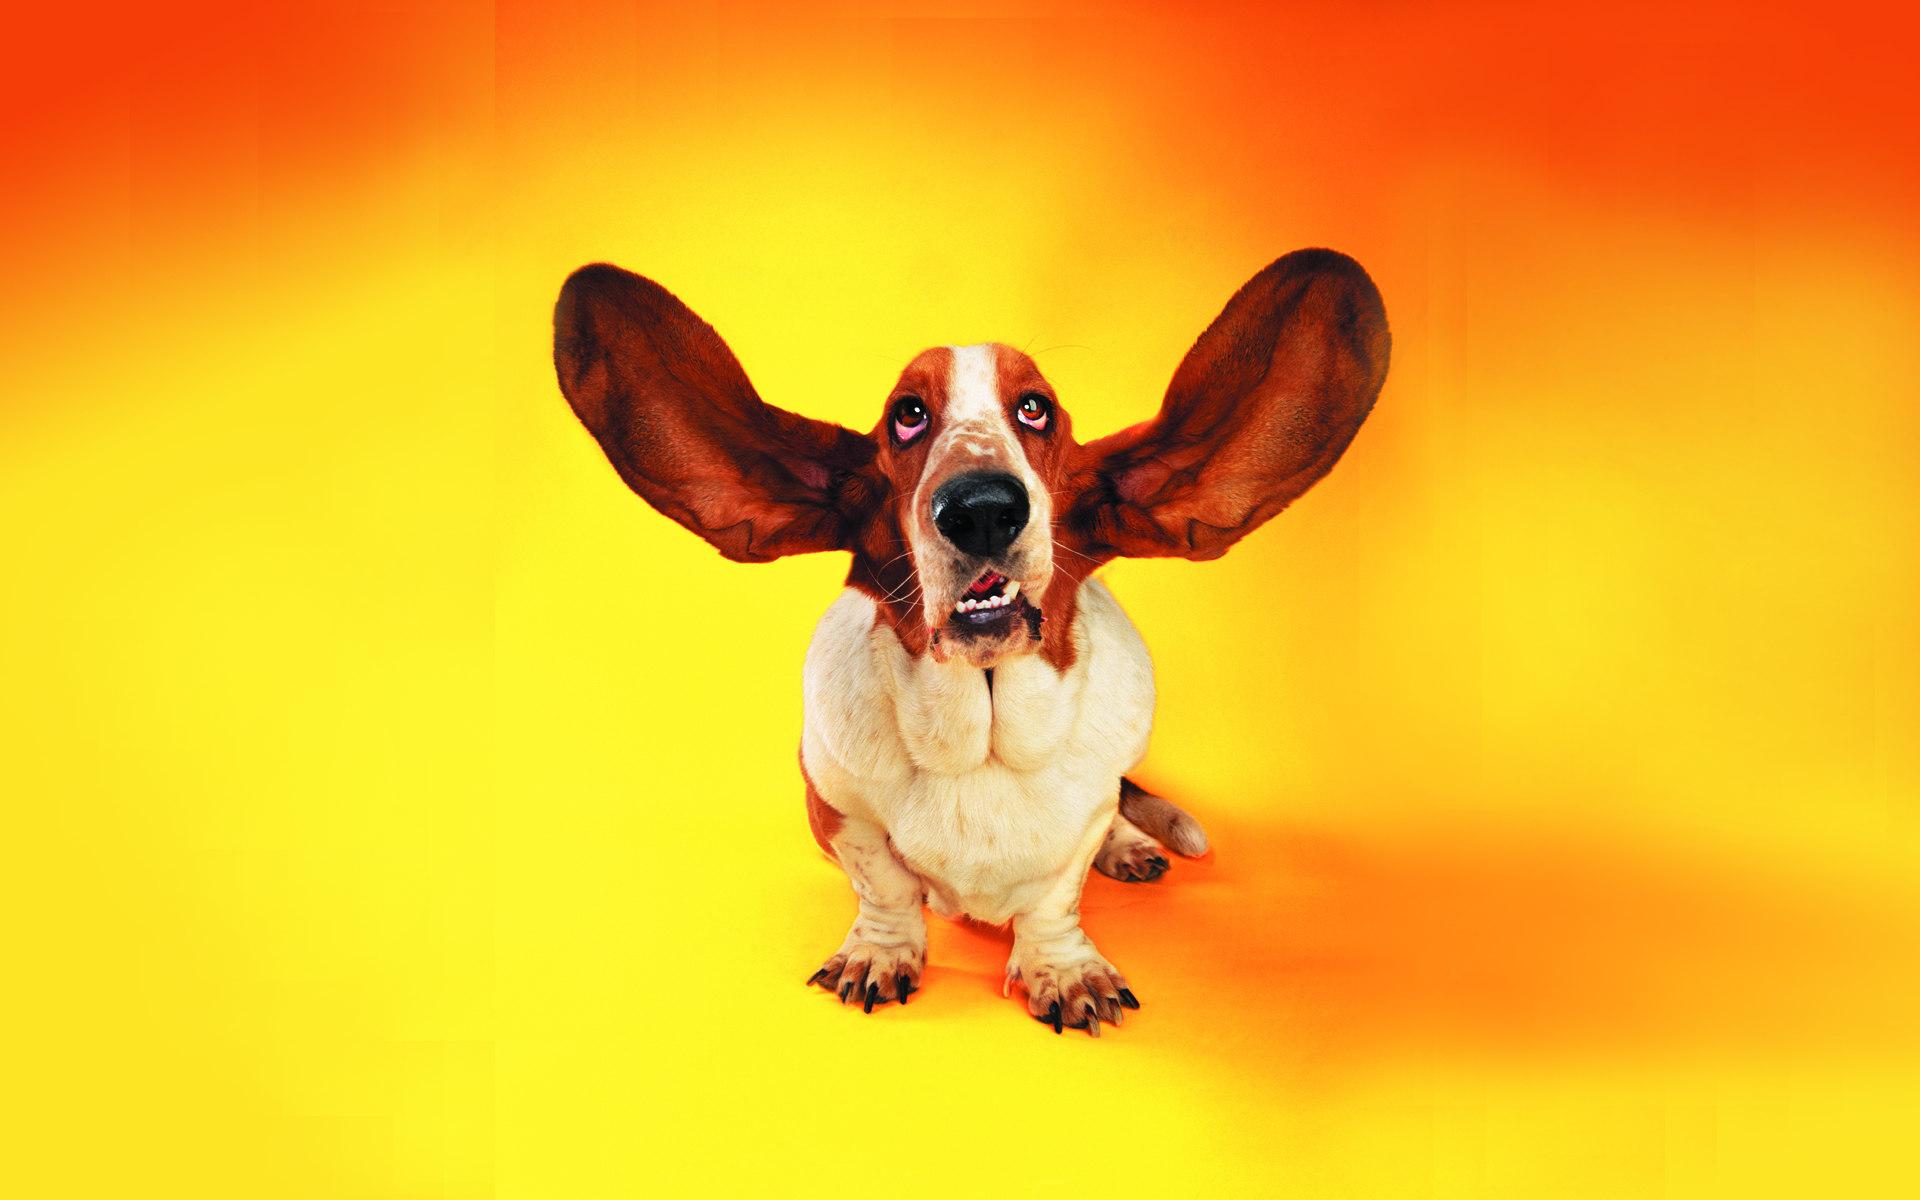 funny dog hd wallpaper - photo #6